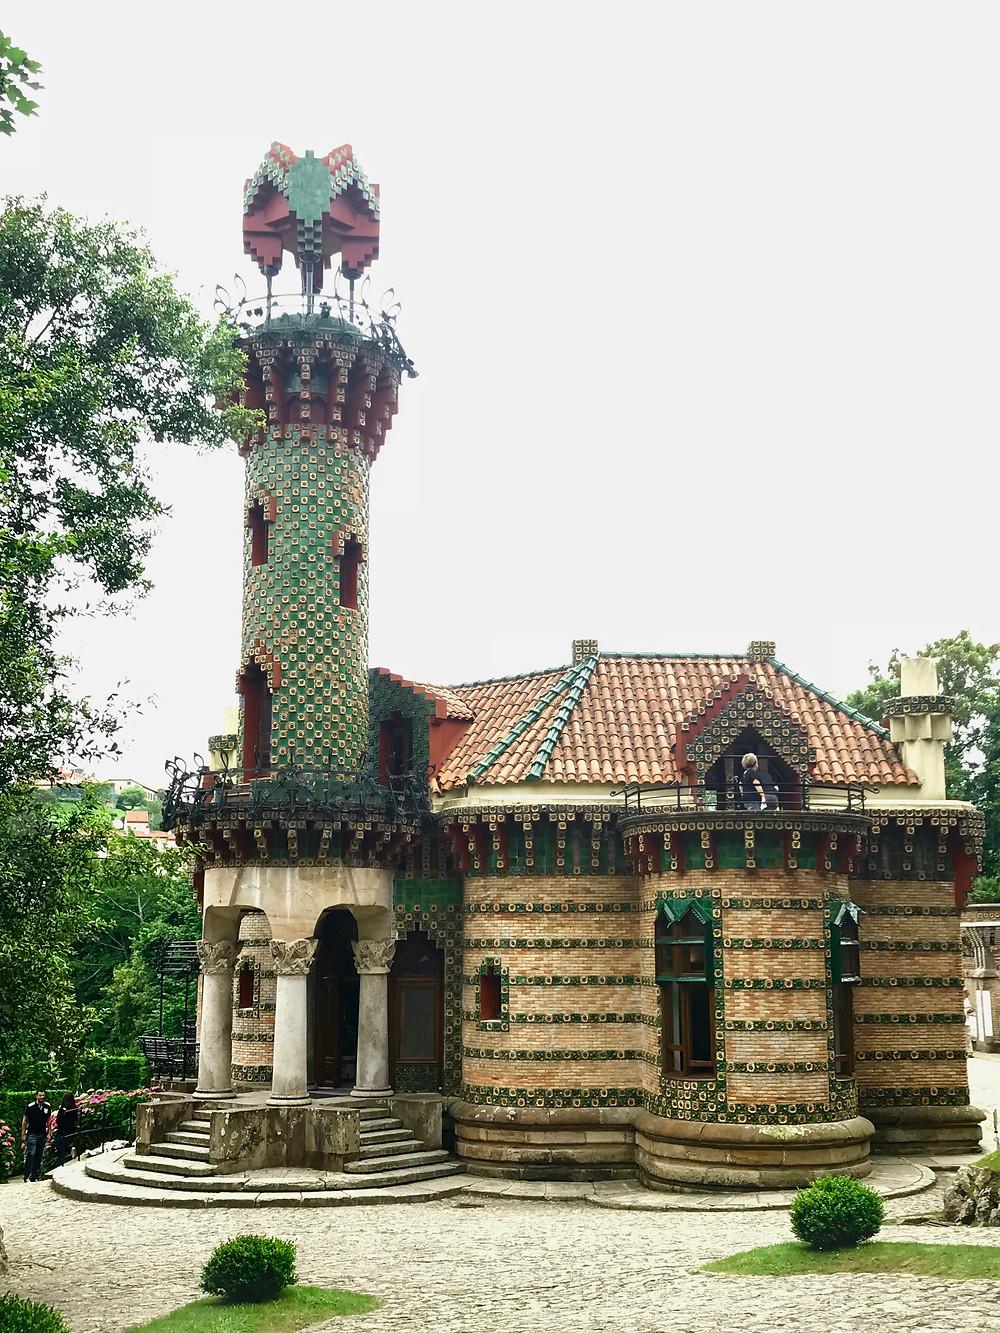 Gaudi's El Capricho in Comillas Spain, built between 1835-85